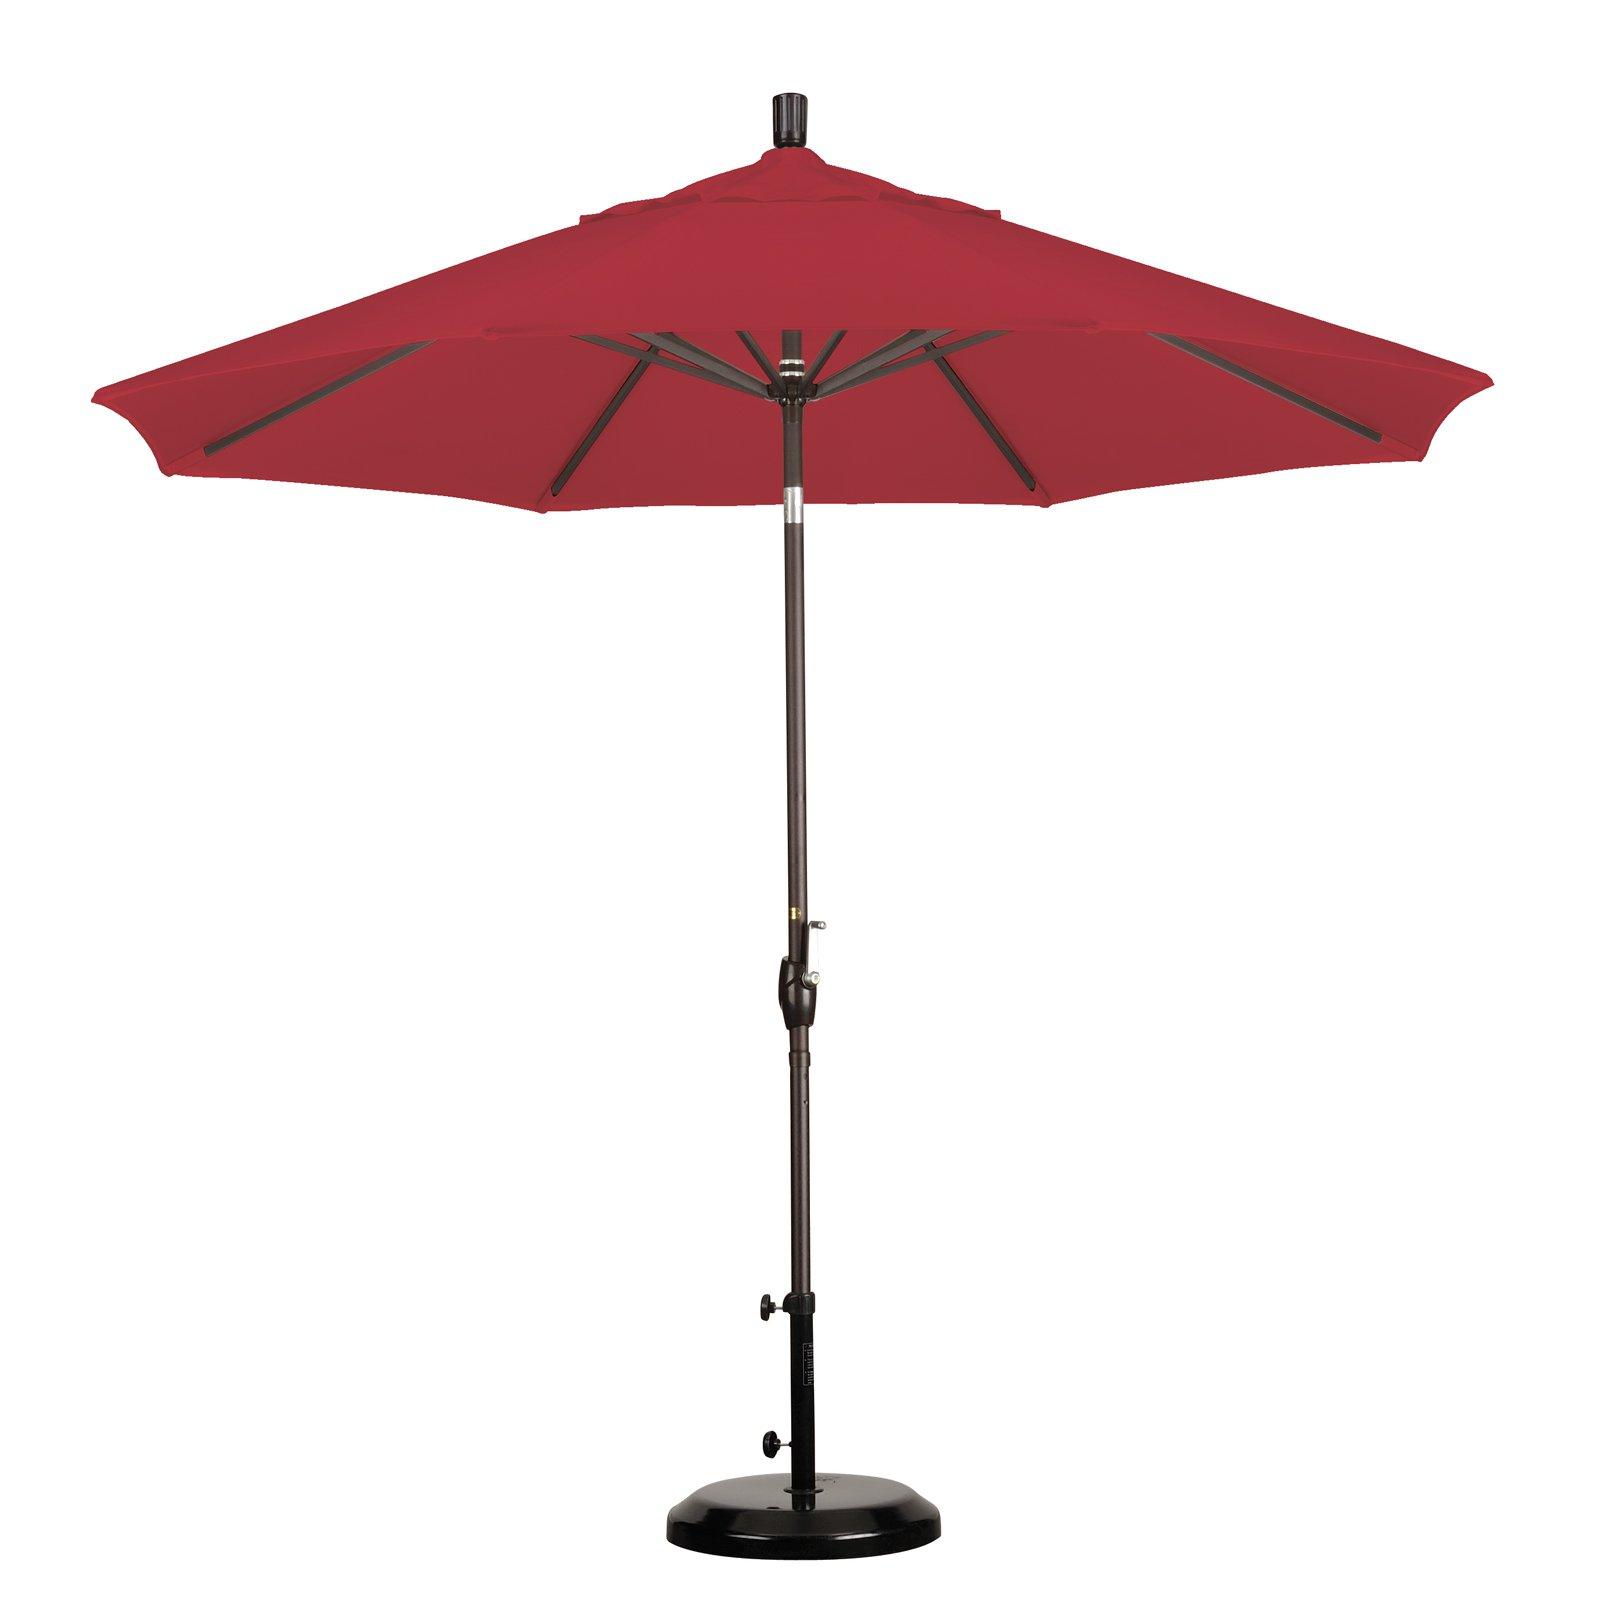 California Umbrella 7.5' Market Patio Umbrella in Burgandy